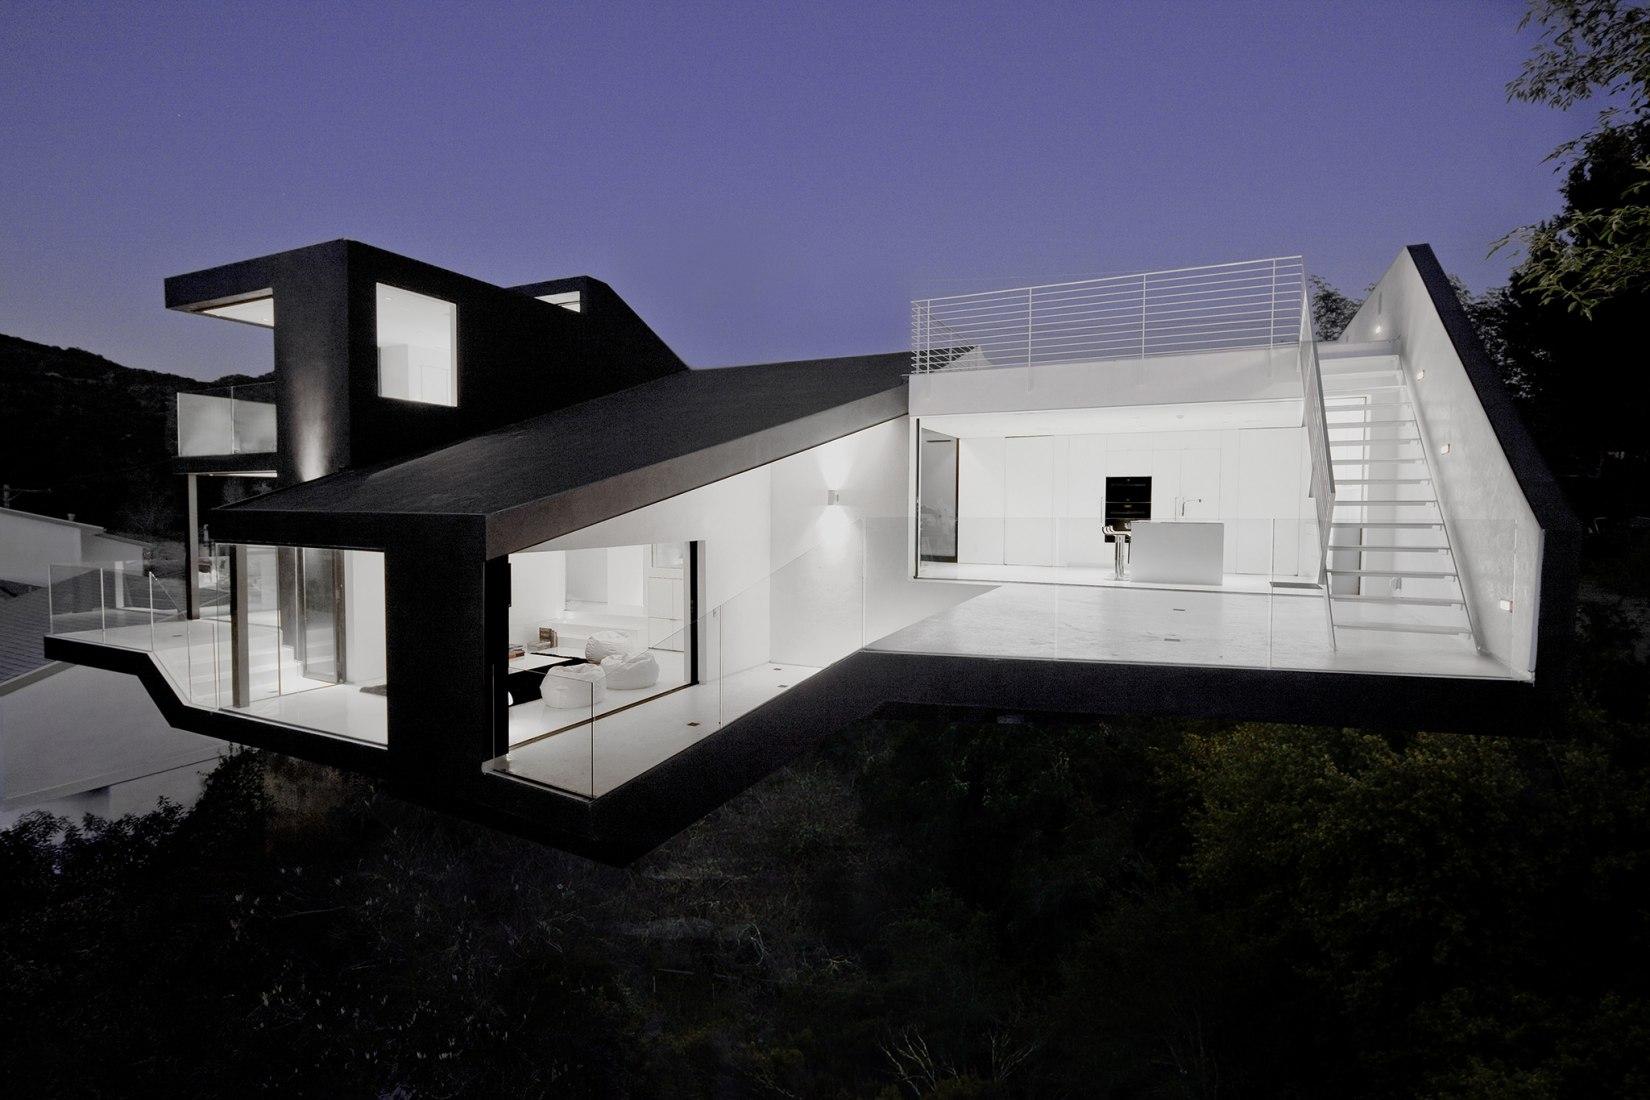 Nakahouse, Los Angeles. XTEN Architecture. Fotografía © Steve King.